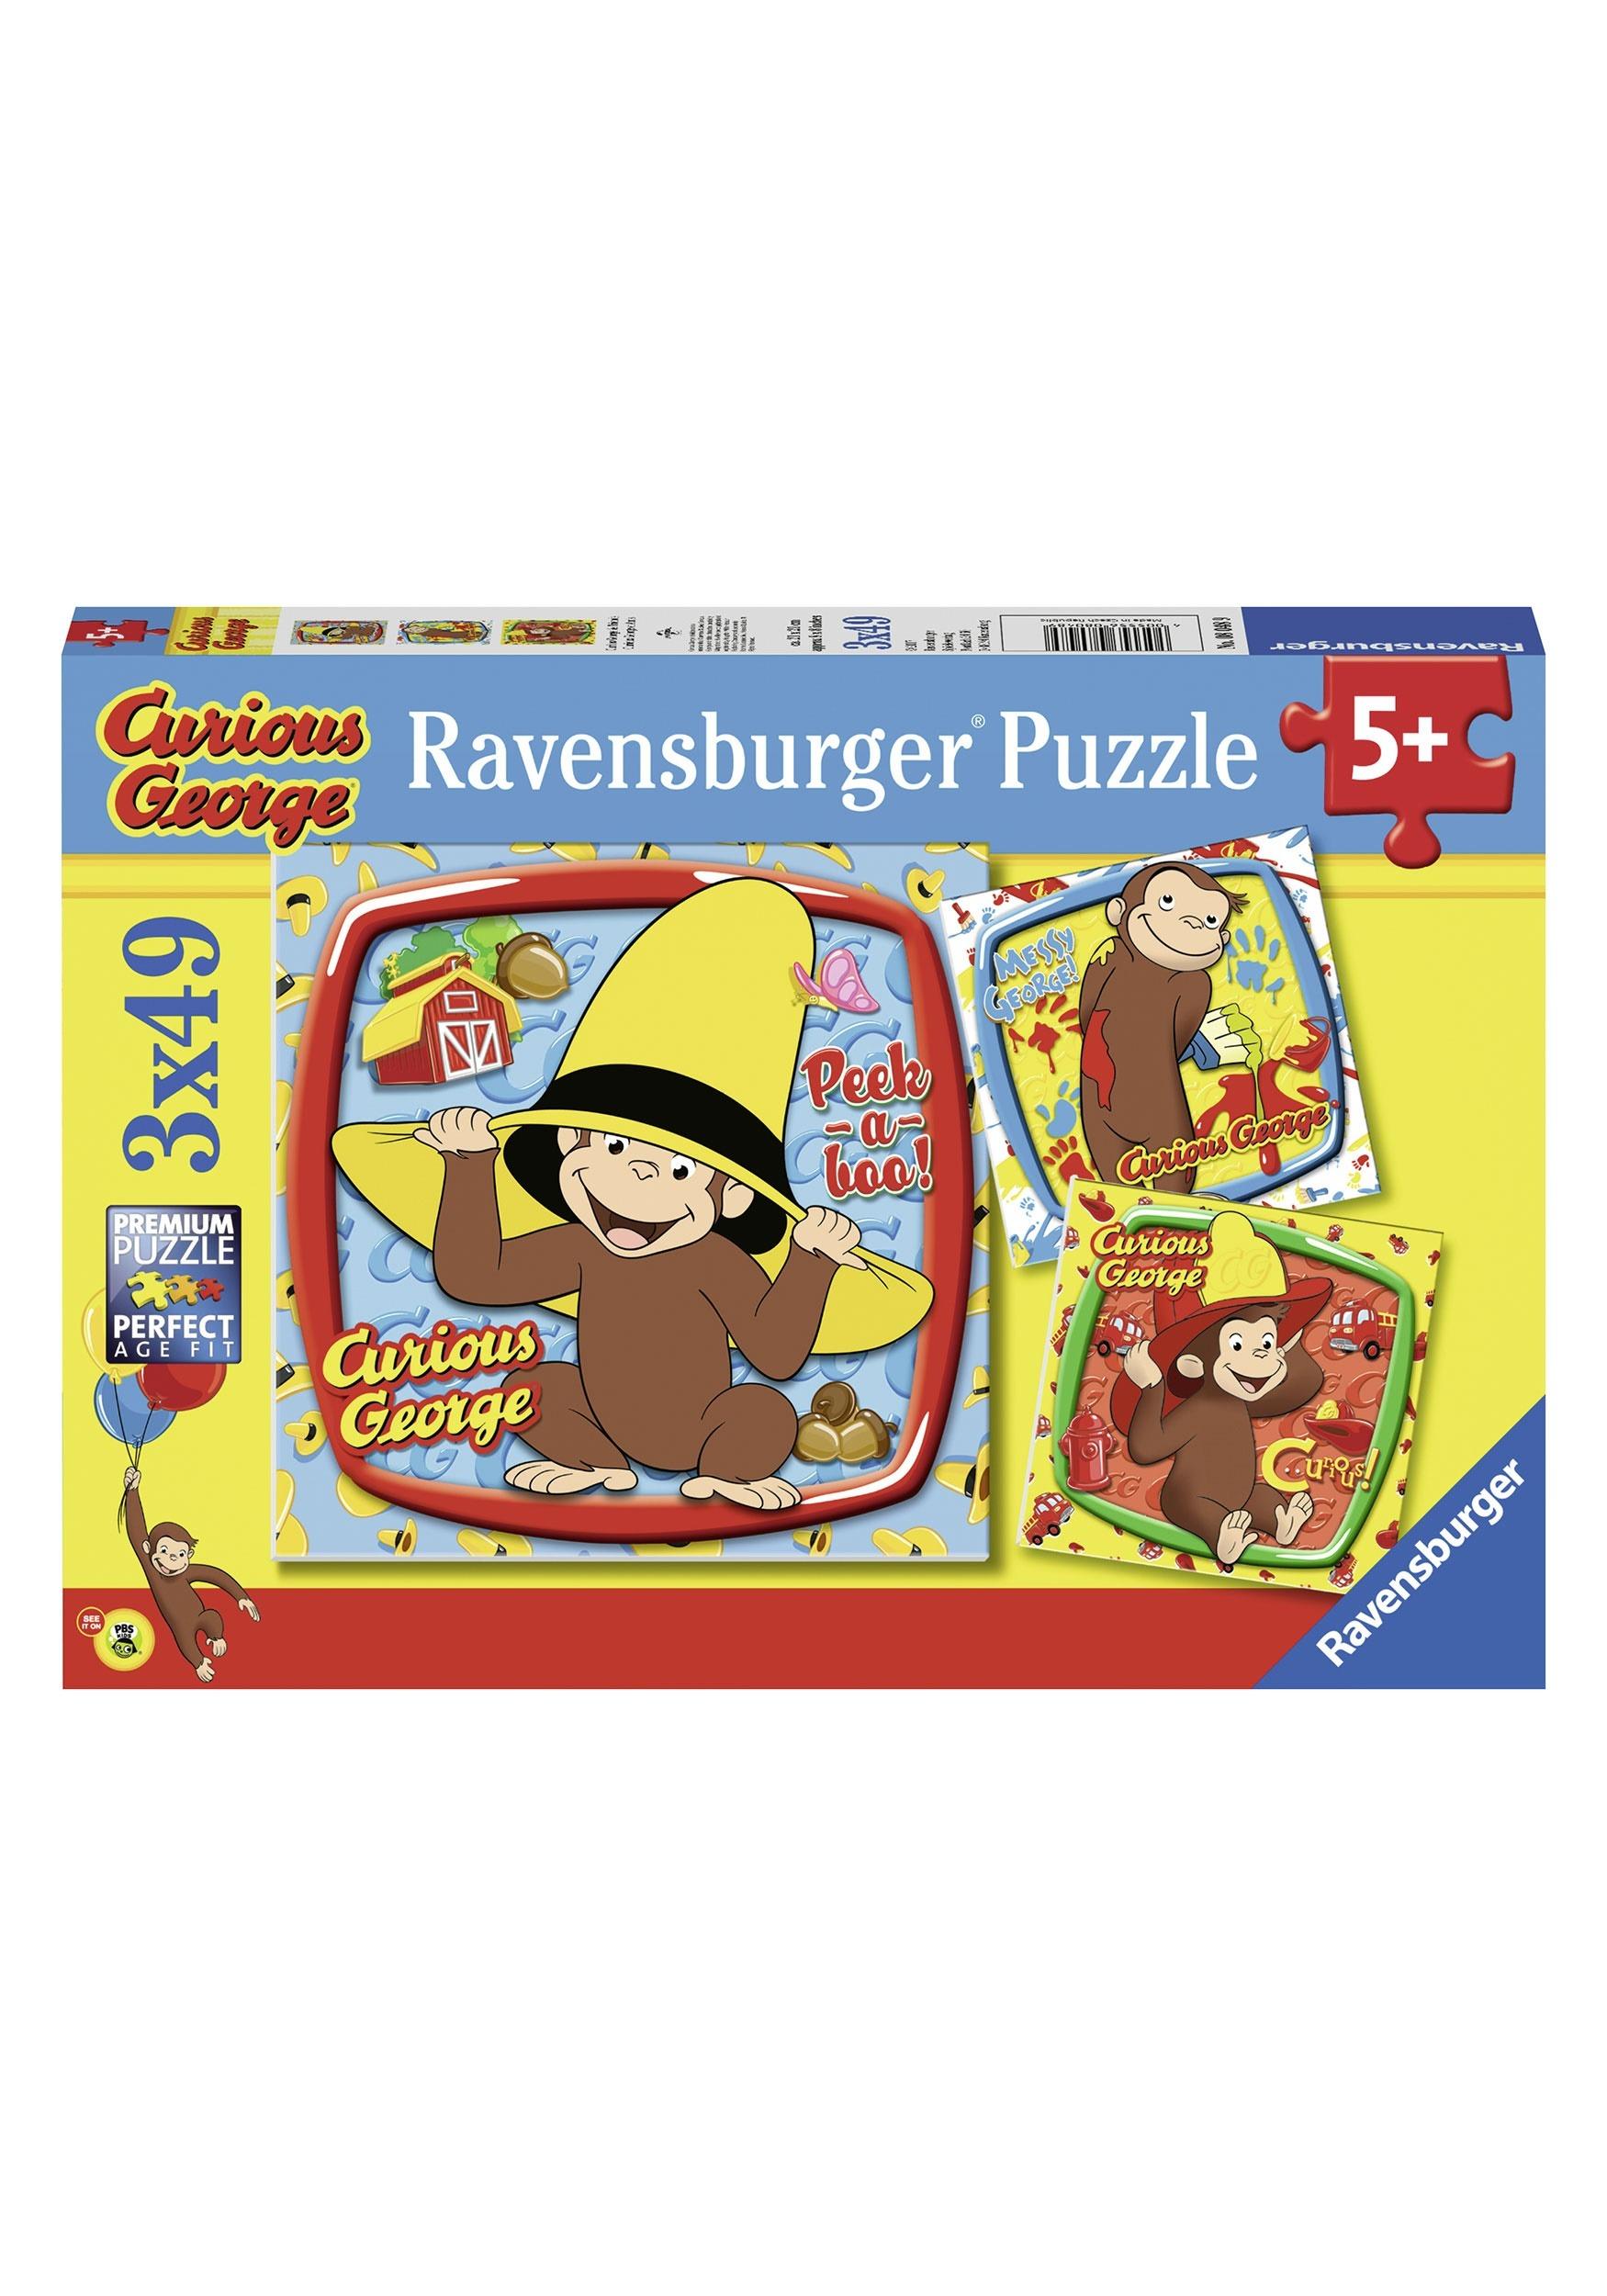 Curious George Christmas Light Game Hoodie